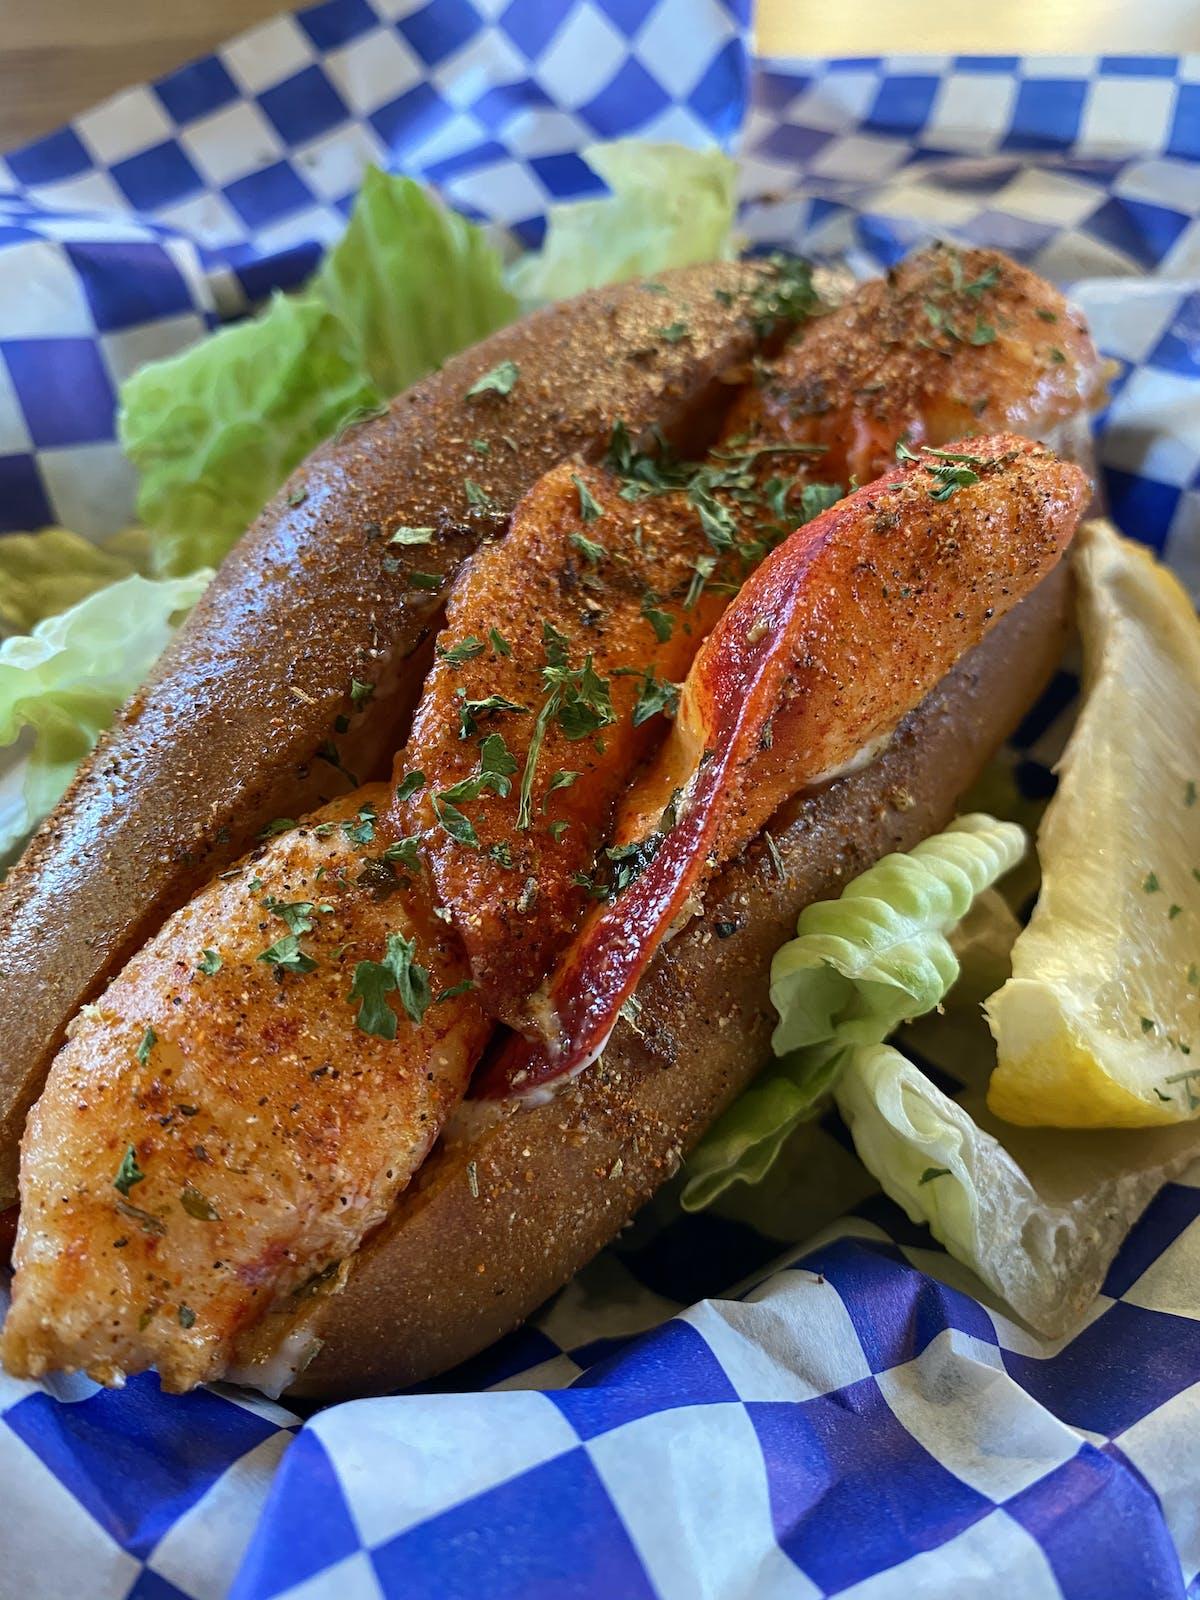 a sandwich on a blue plate